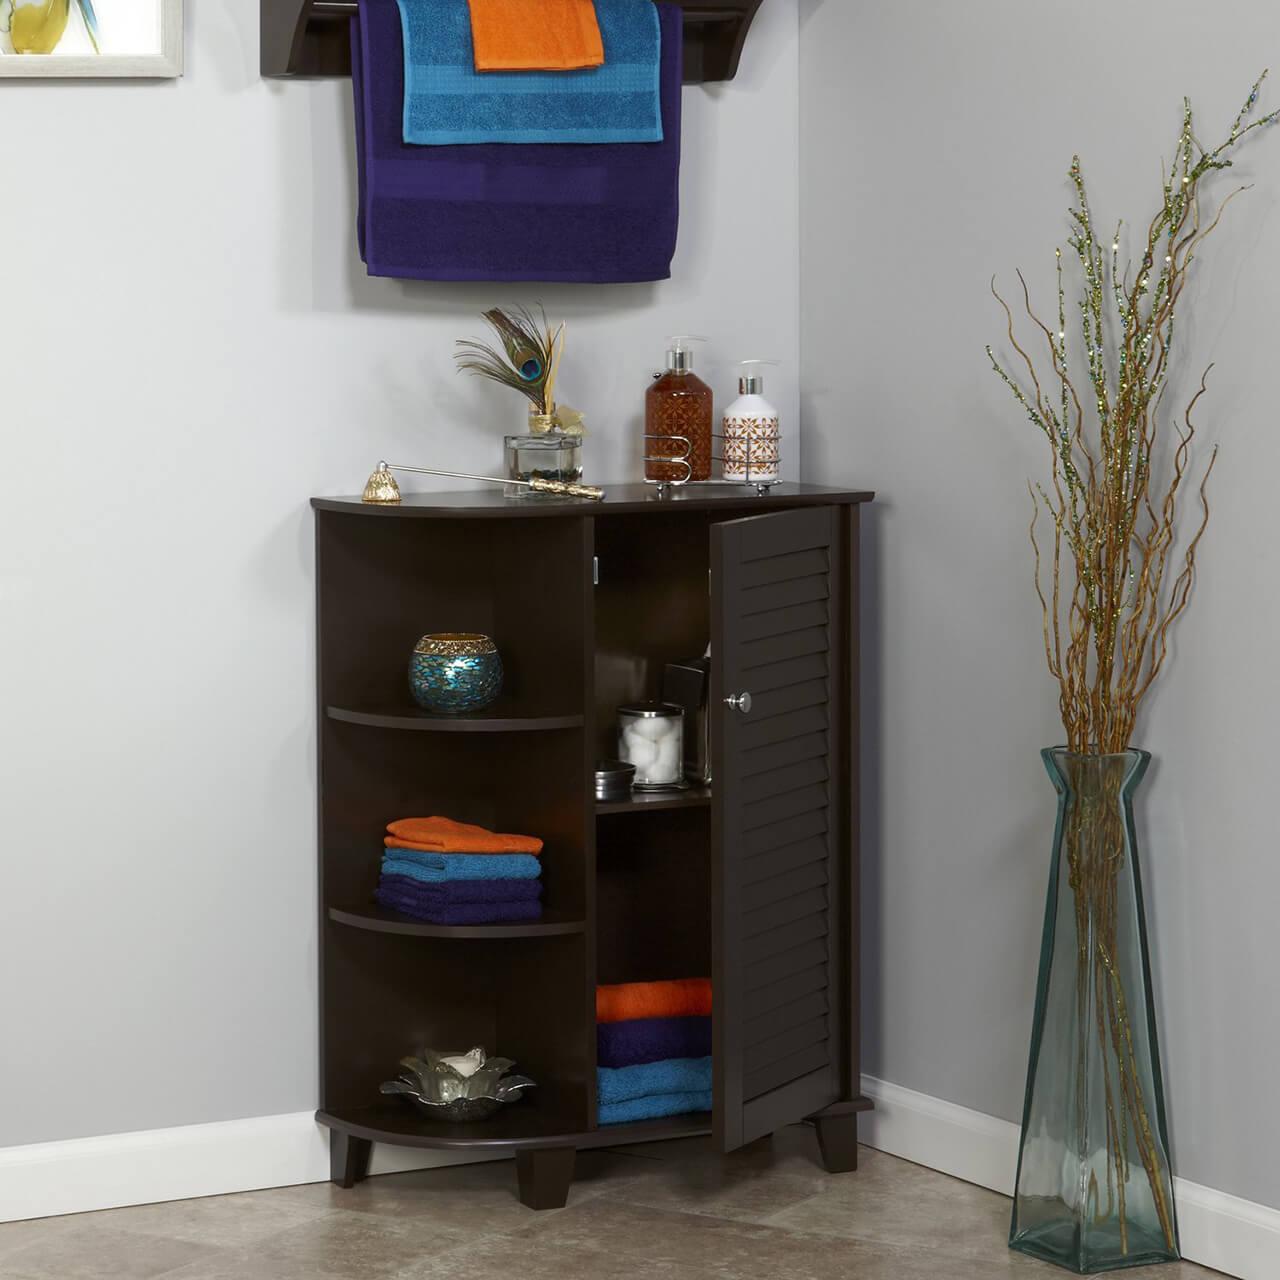 RiverRidge Ellsworth Floor Cabinet with Side Shelves